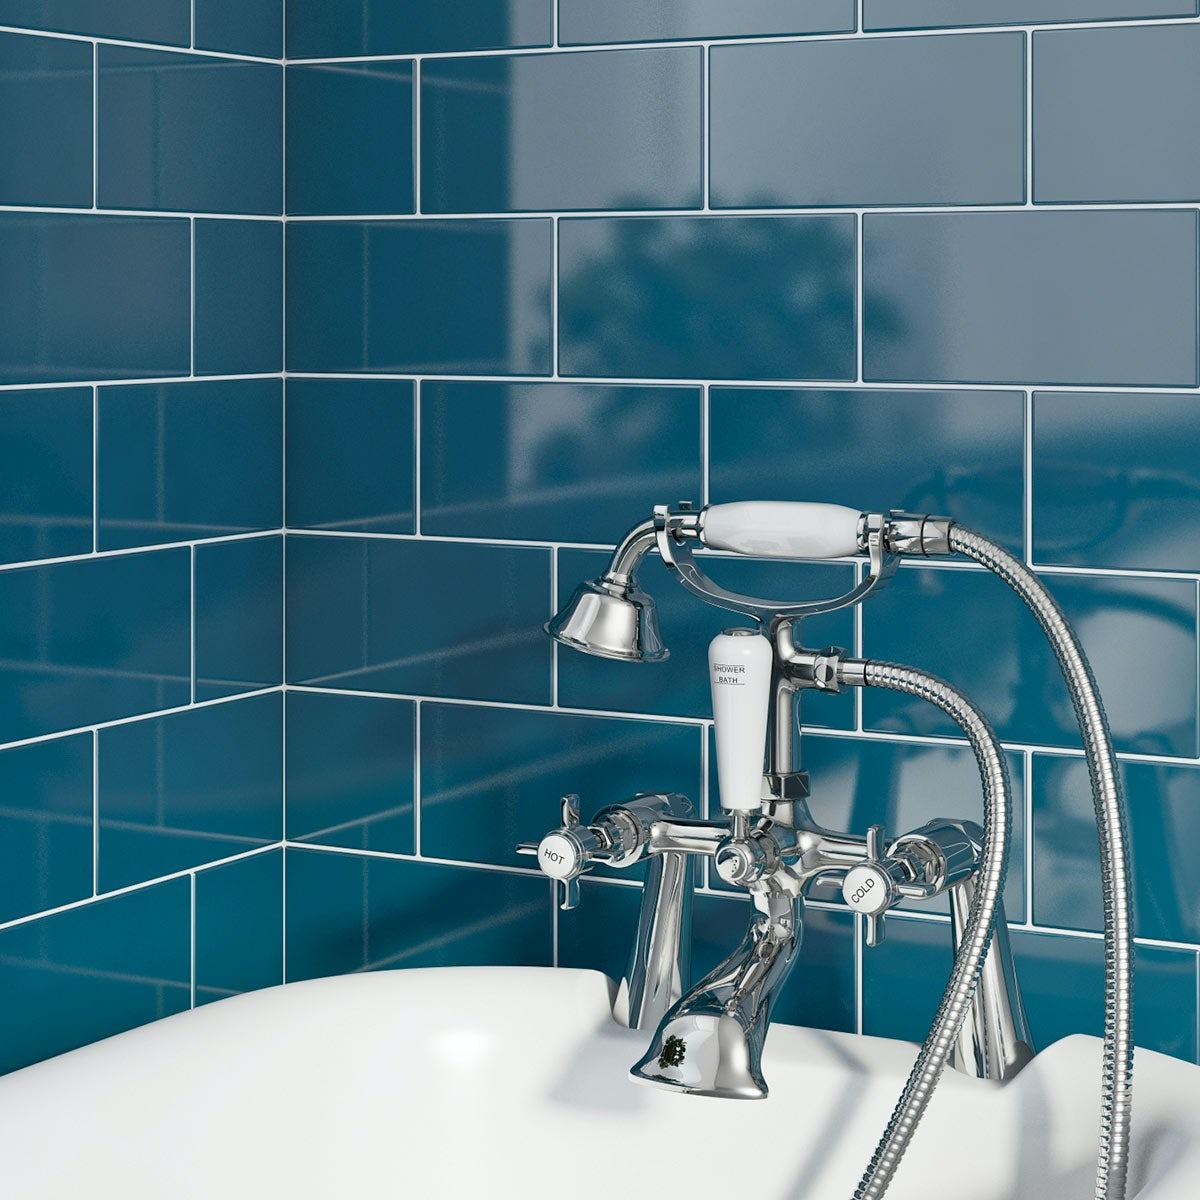 British Ceramic Tile Metro Flat Navy, Navy Blue Bathroom Tiles